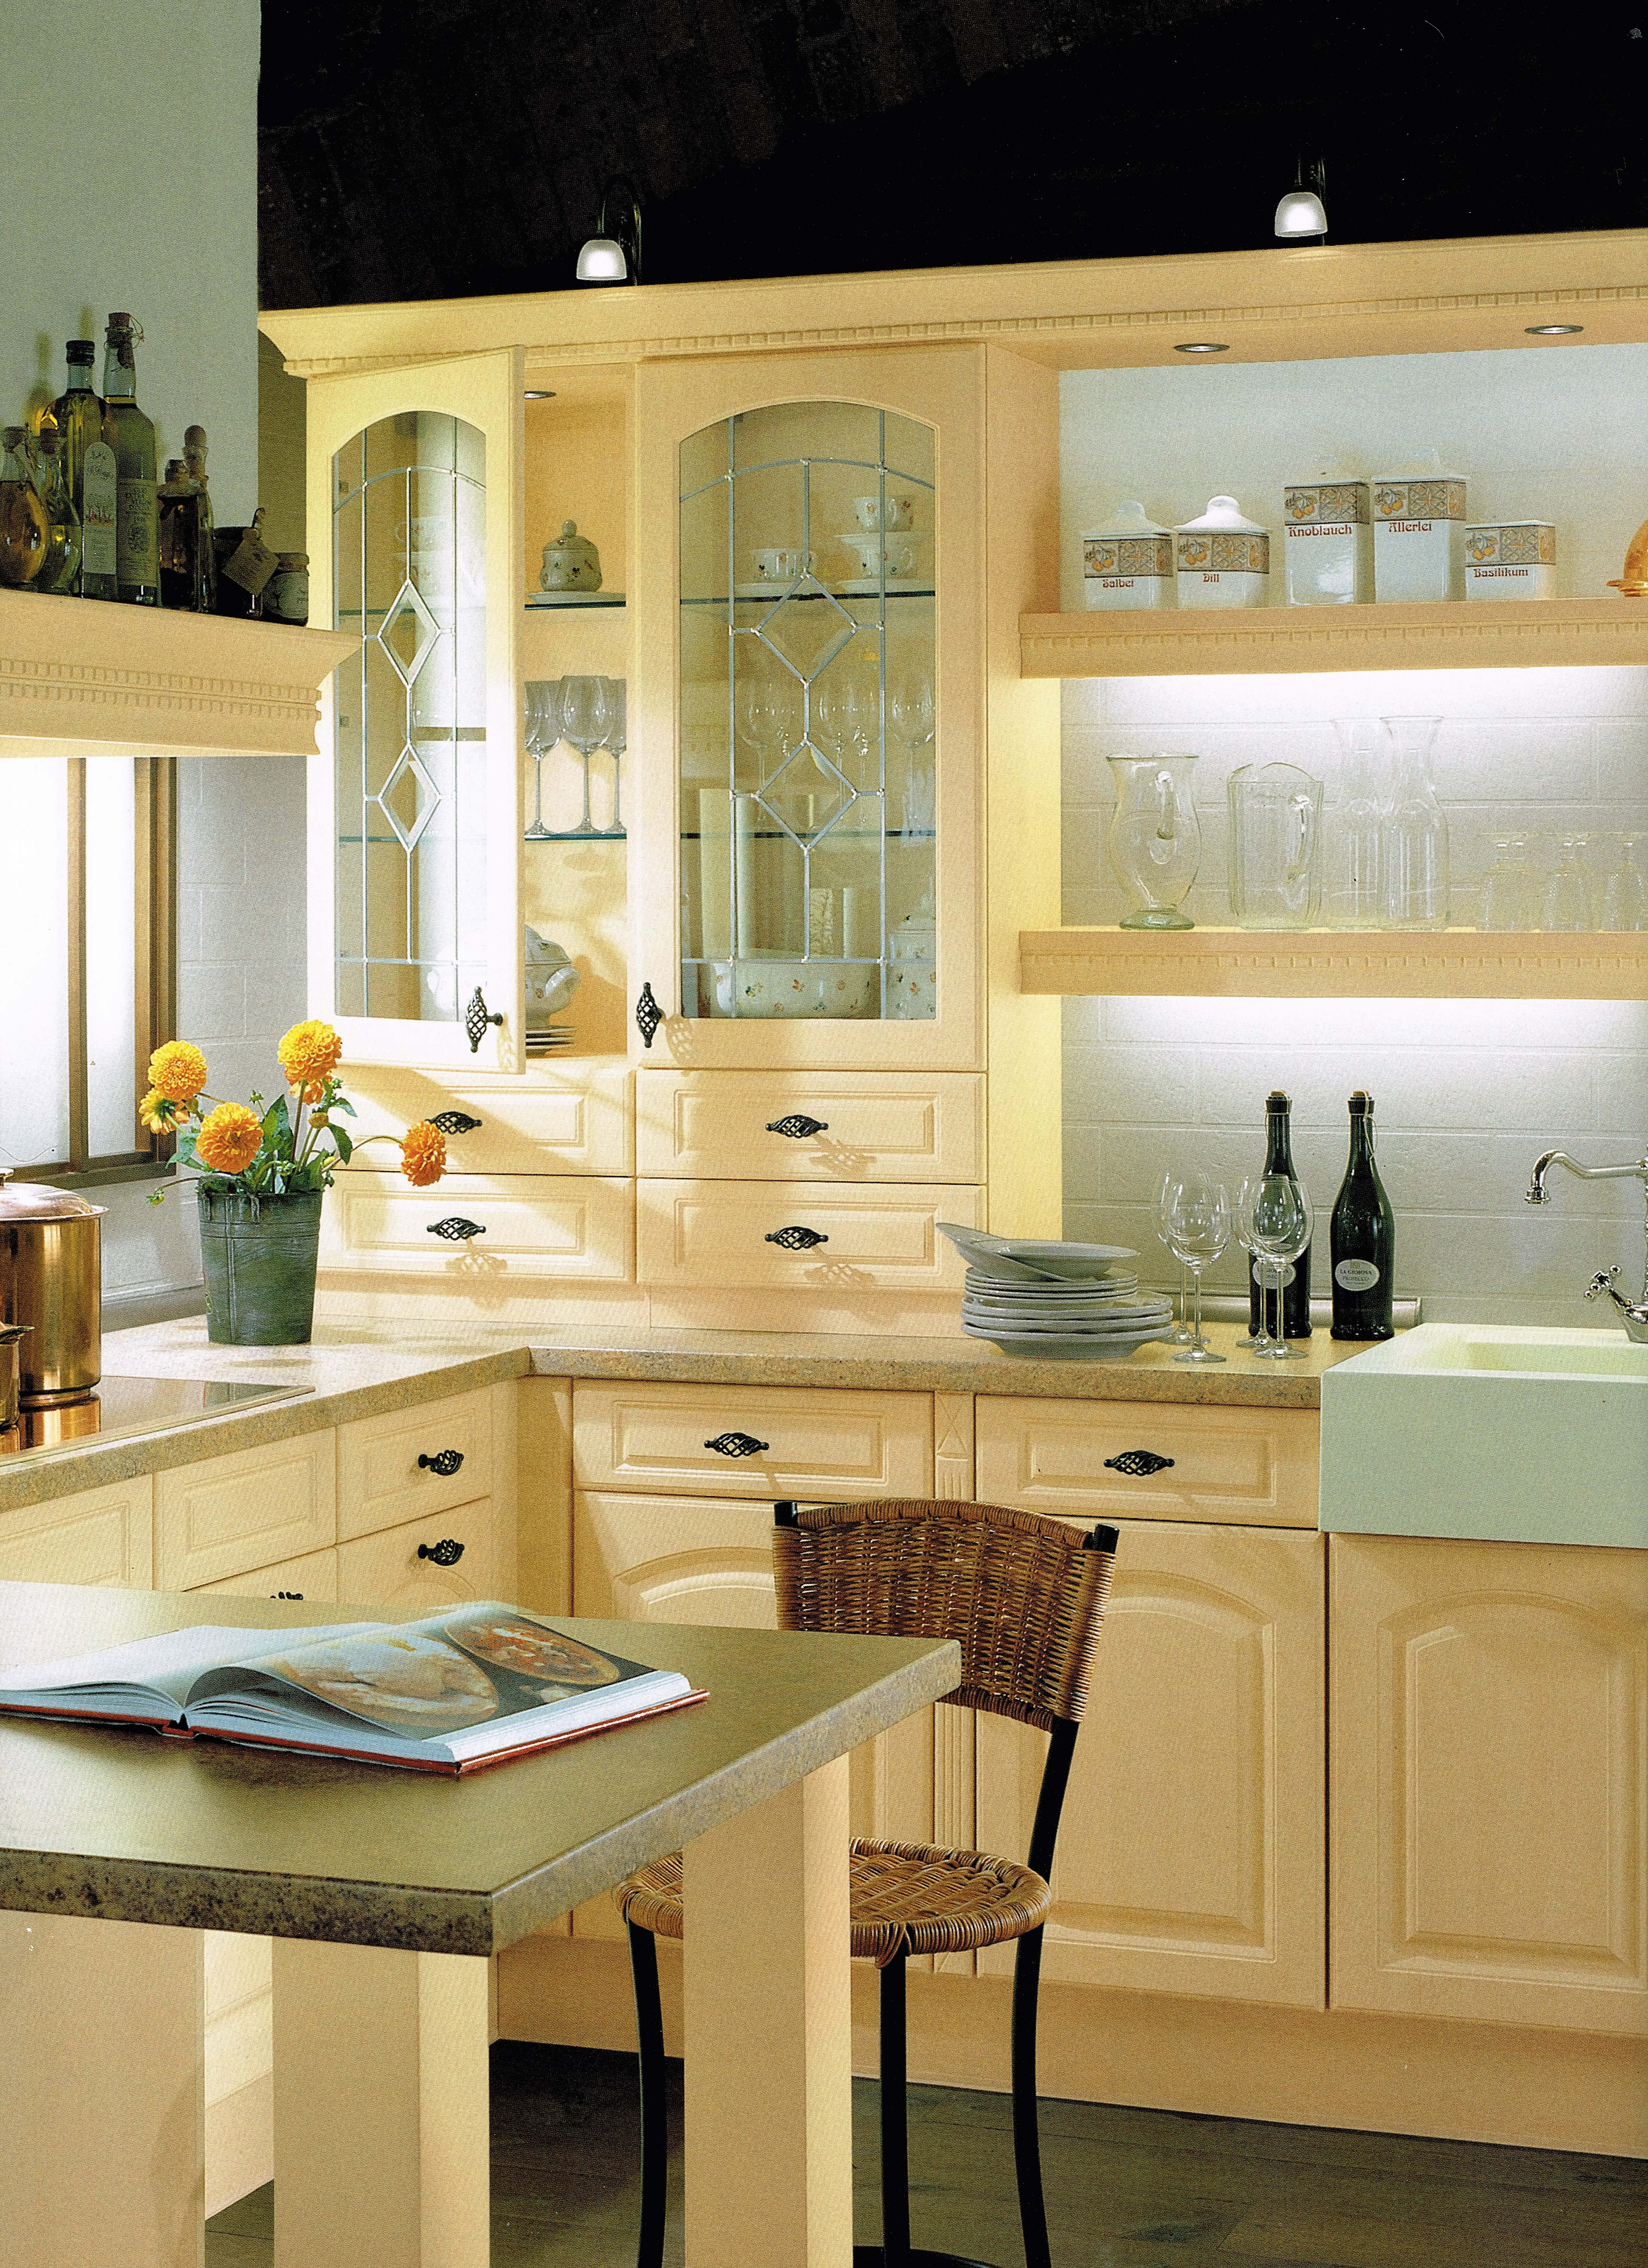 diy: küche selbst gebaut - youtube. landhausküche | selbst.de ...